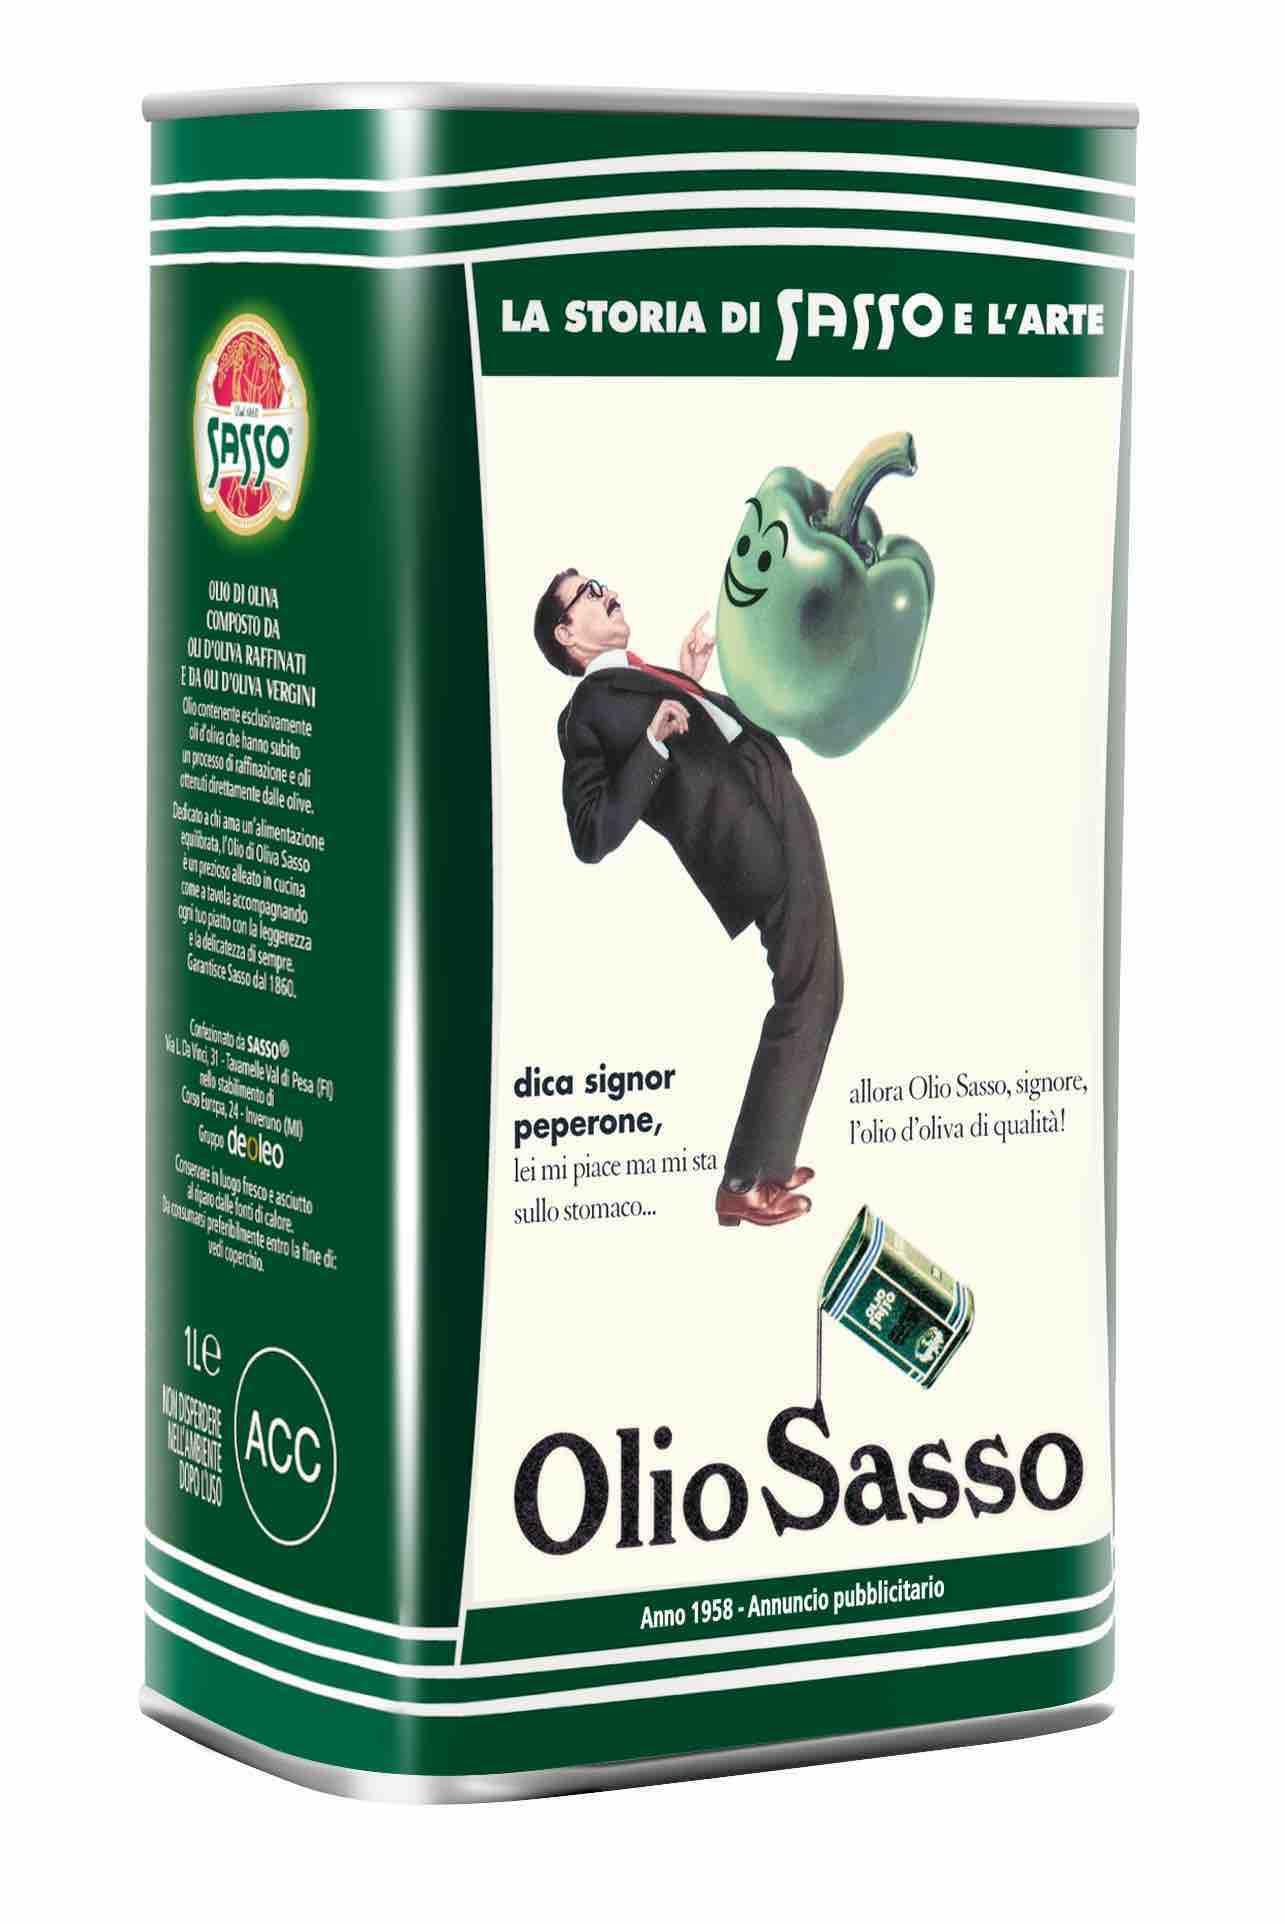 03_Sasso Oliva 1L storica - peperone